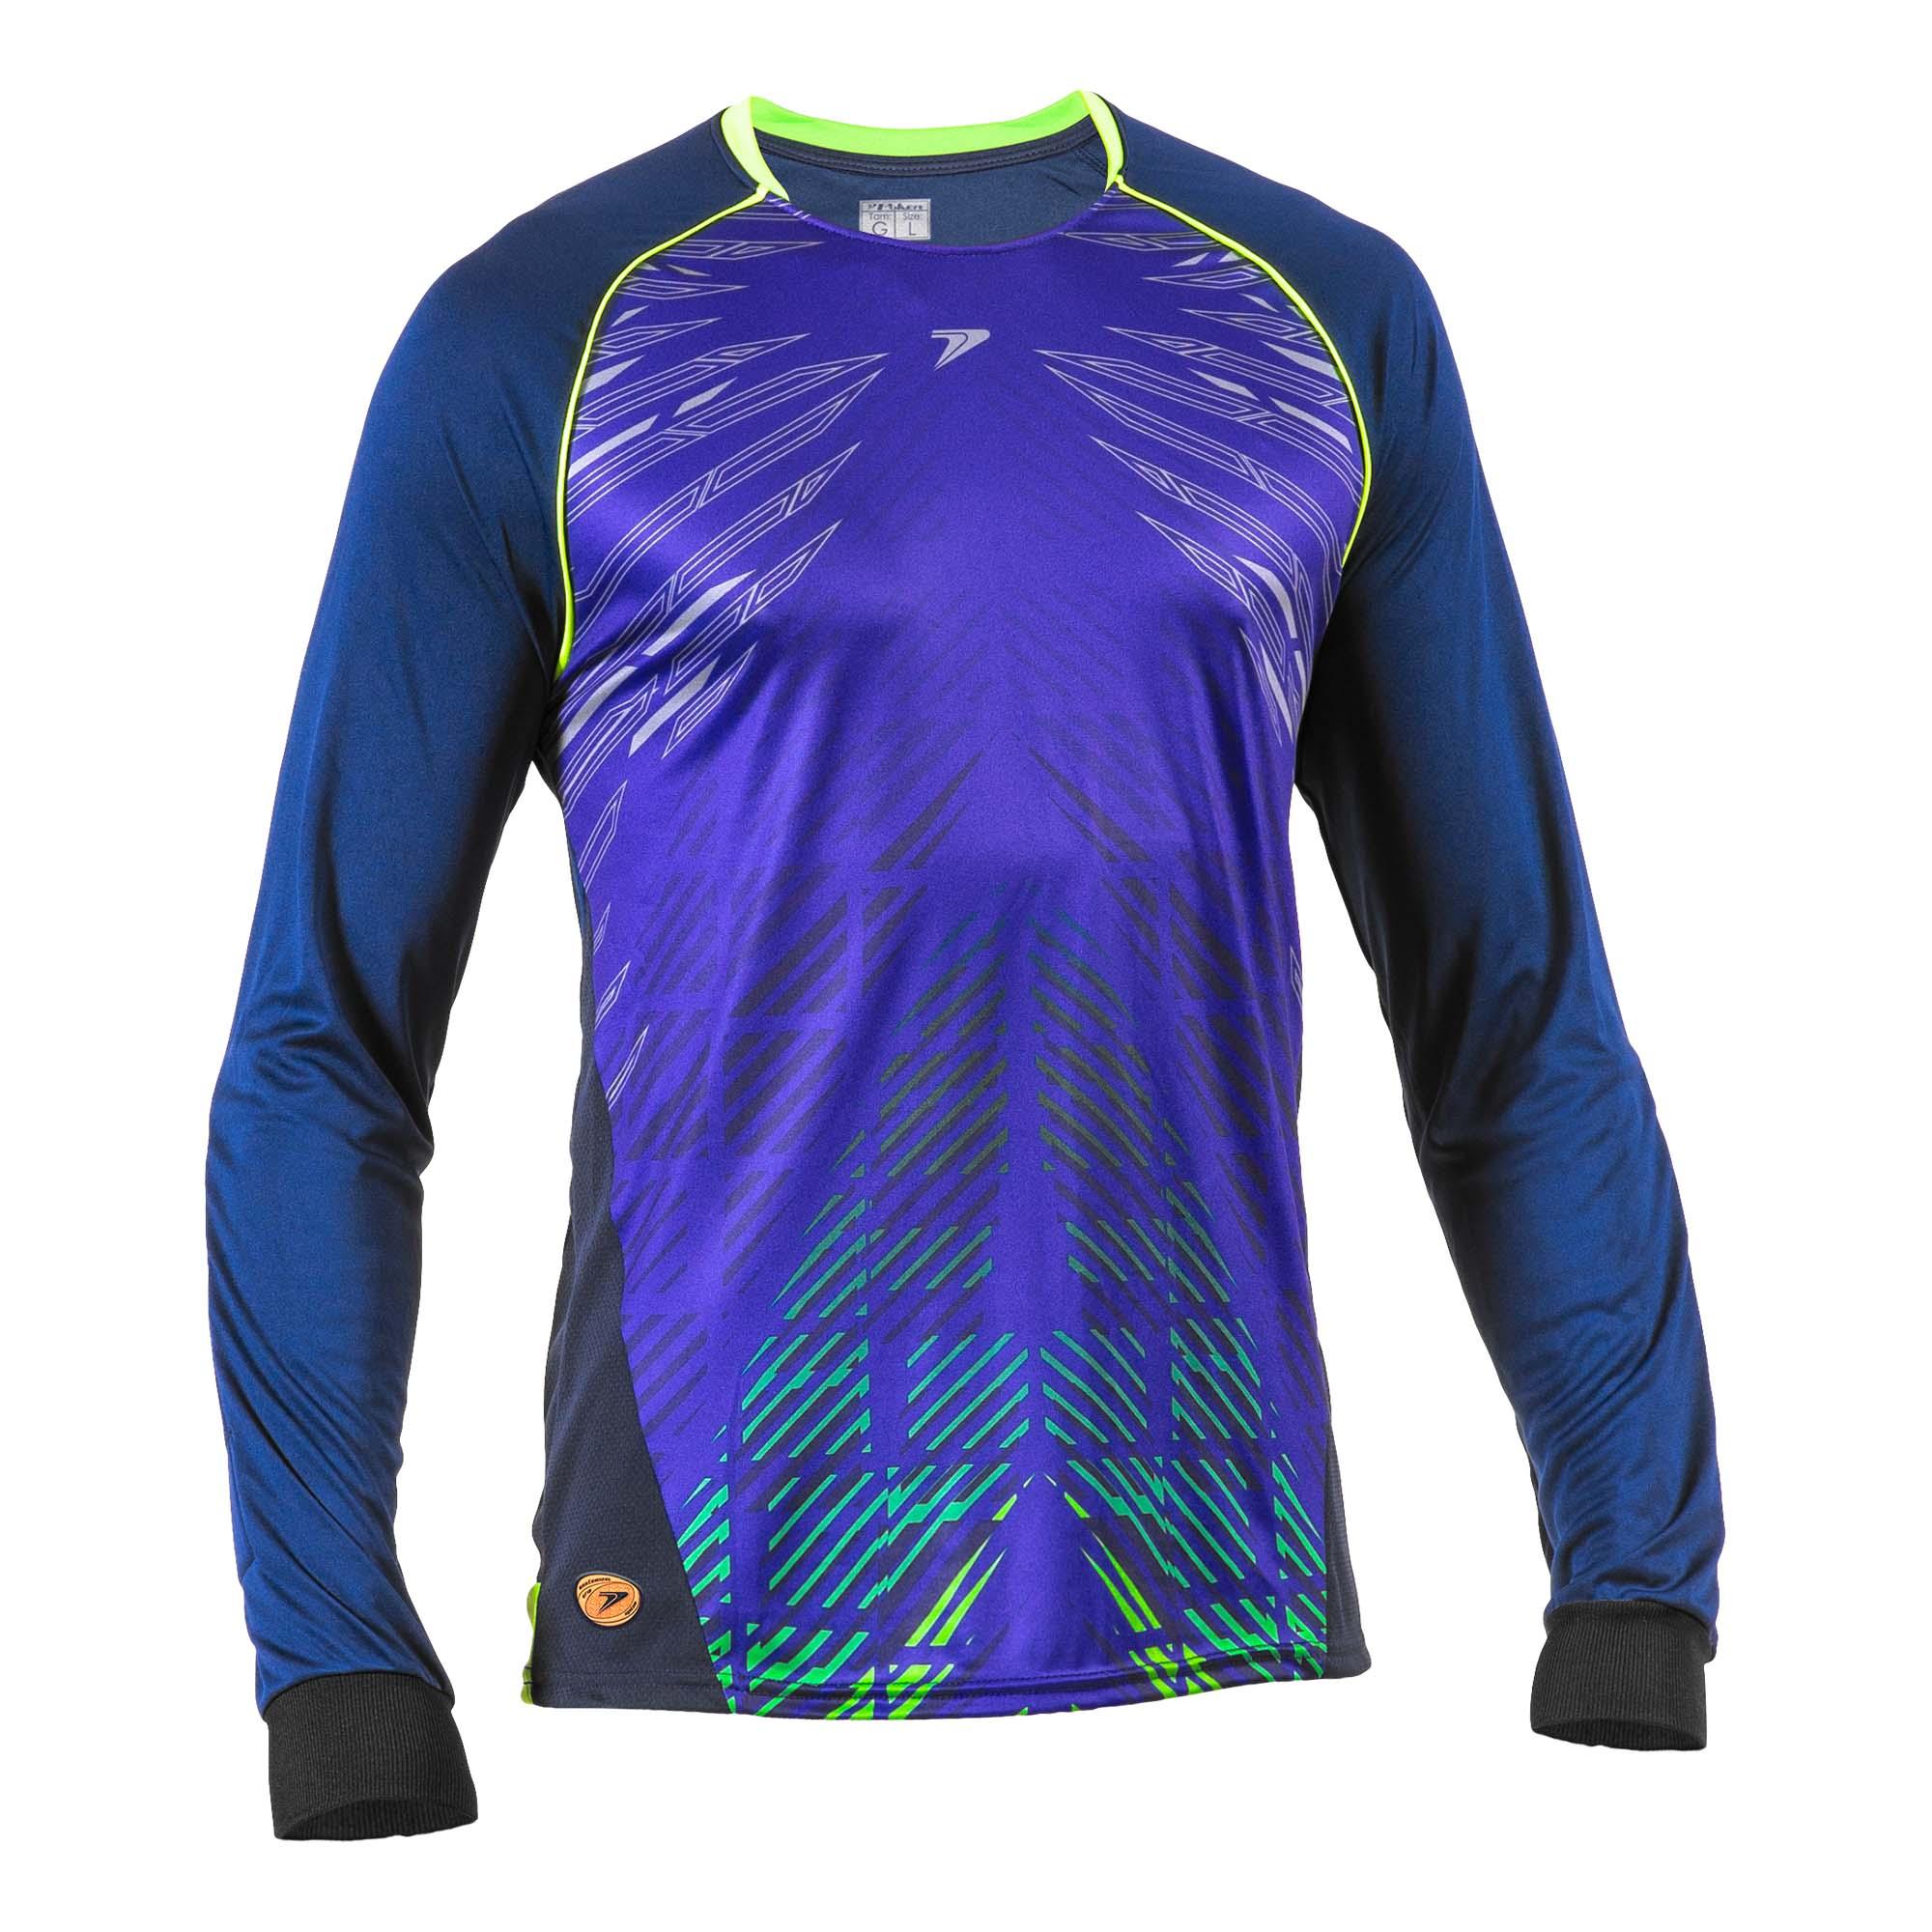 Camisa Gol M/L Sublimax Paredão 04105